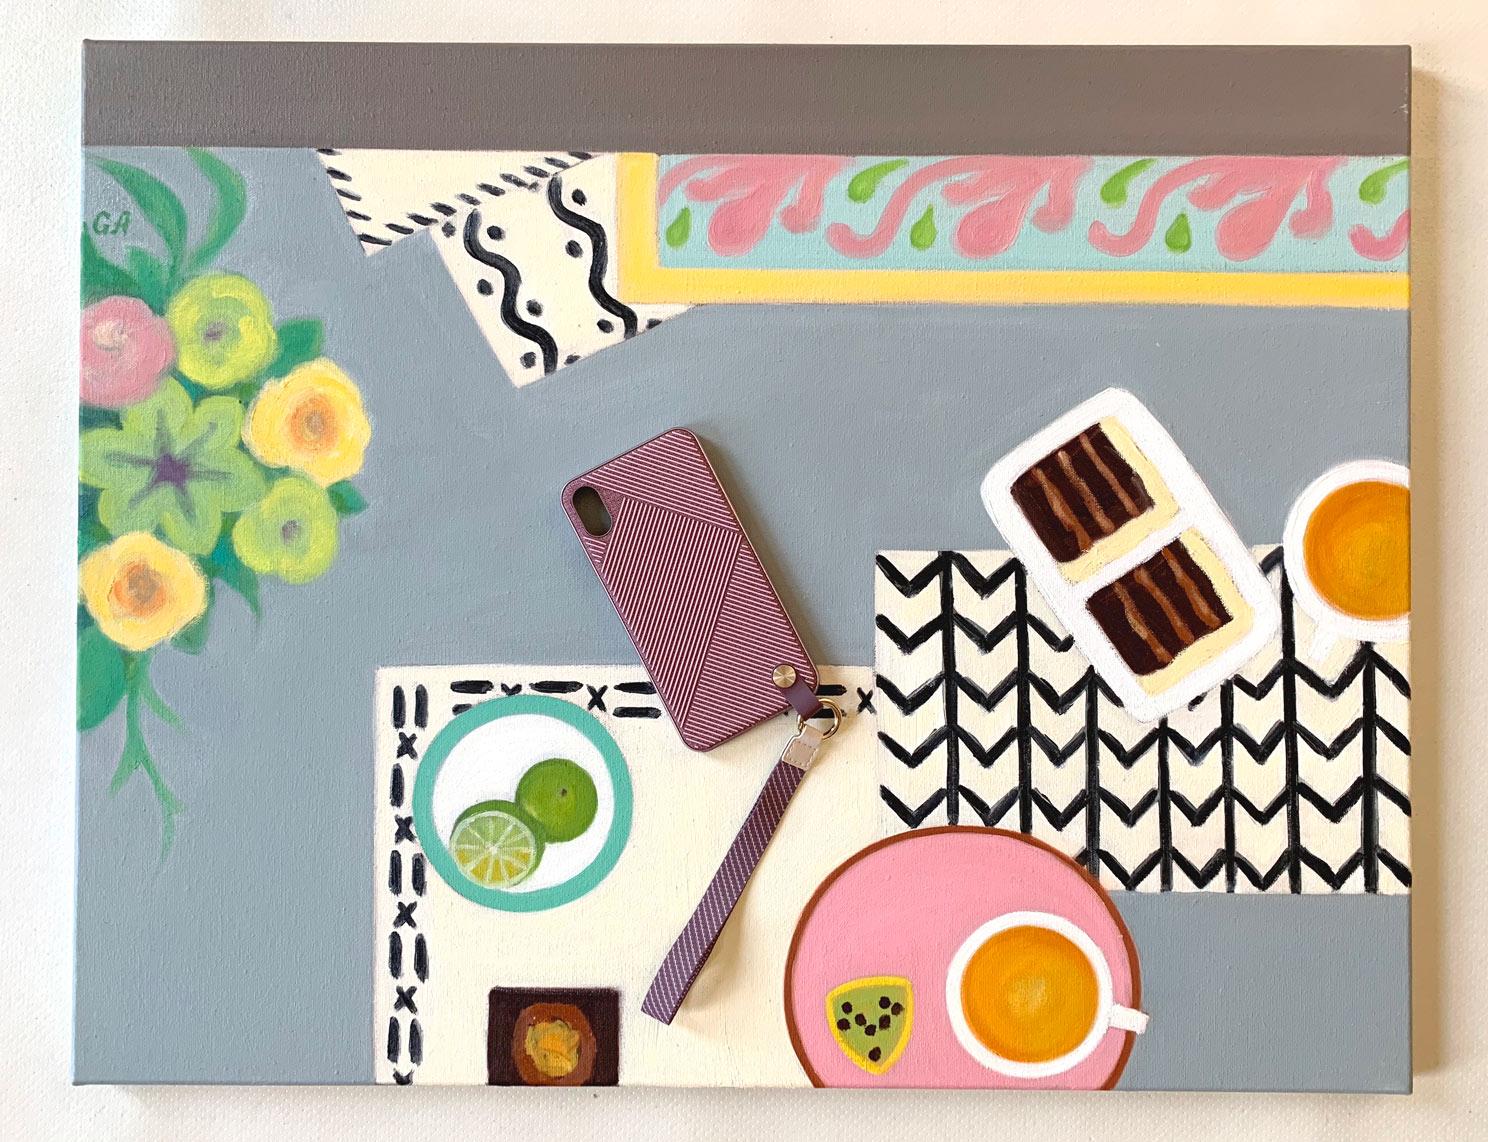 IPhone-XS-Max-Moshi-Altra-Case-Strap-Giselle-Ayupova-Painting-Tea-Chocolate-Cake.jpg